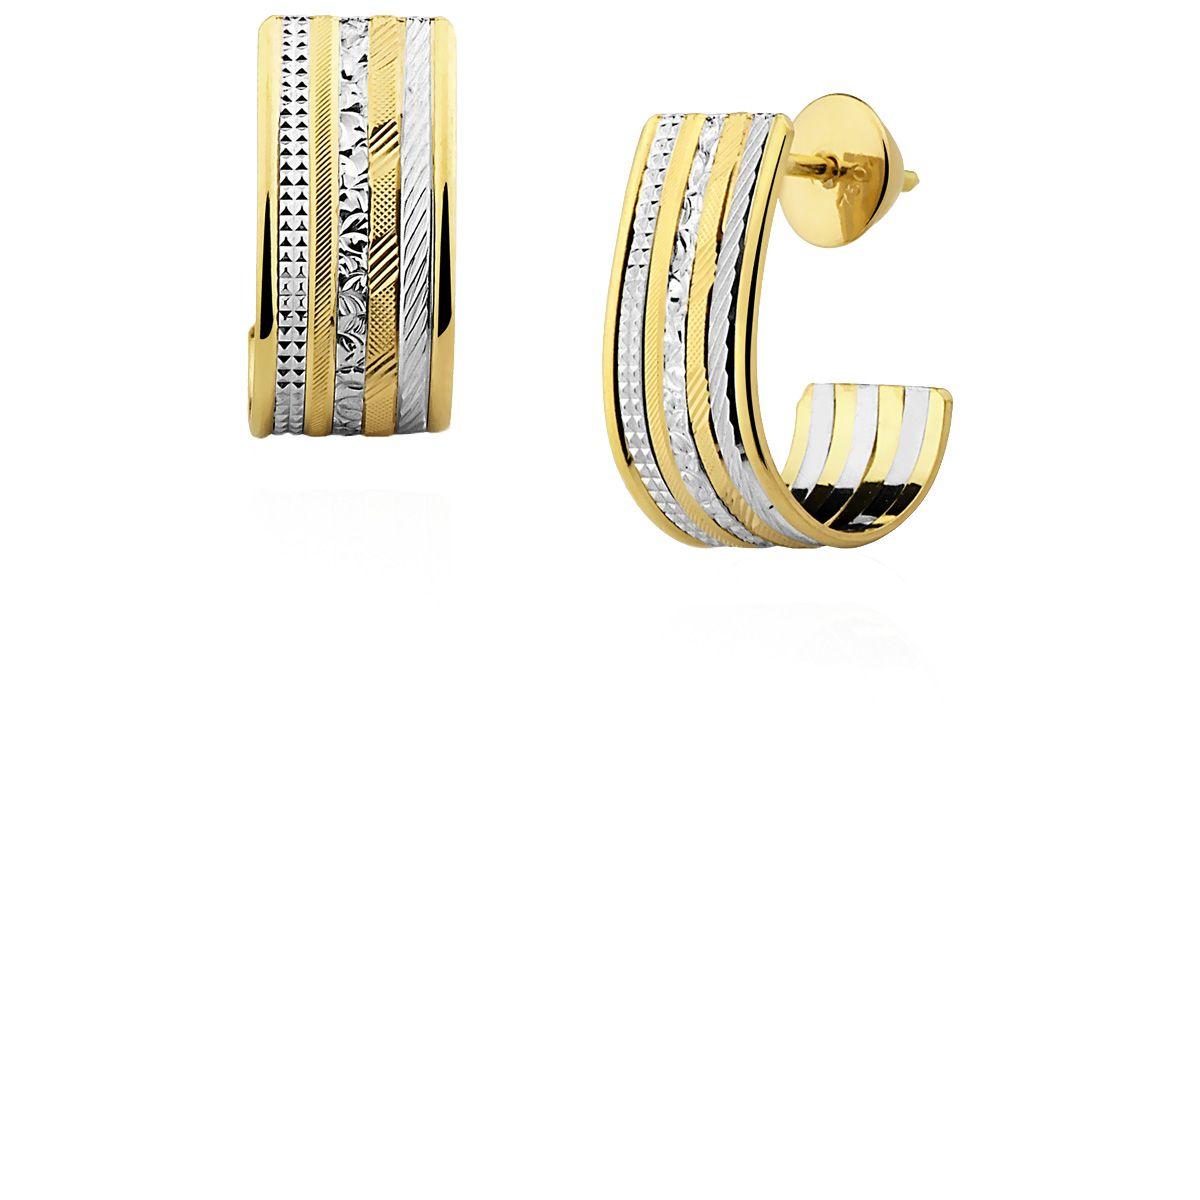 Brincos Ouro 18k Amarelo e Branco 7 elos L 16.5